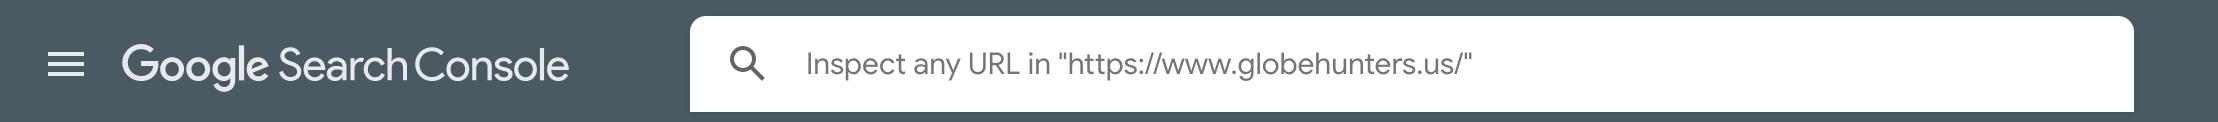 URL Inspect box on Google Search Console